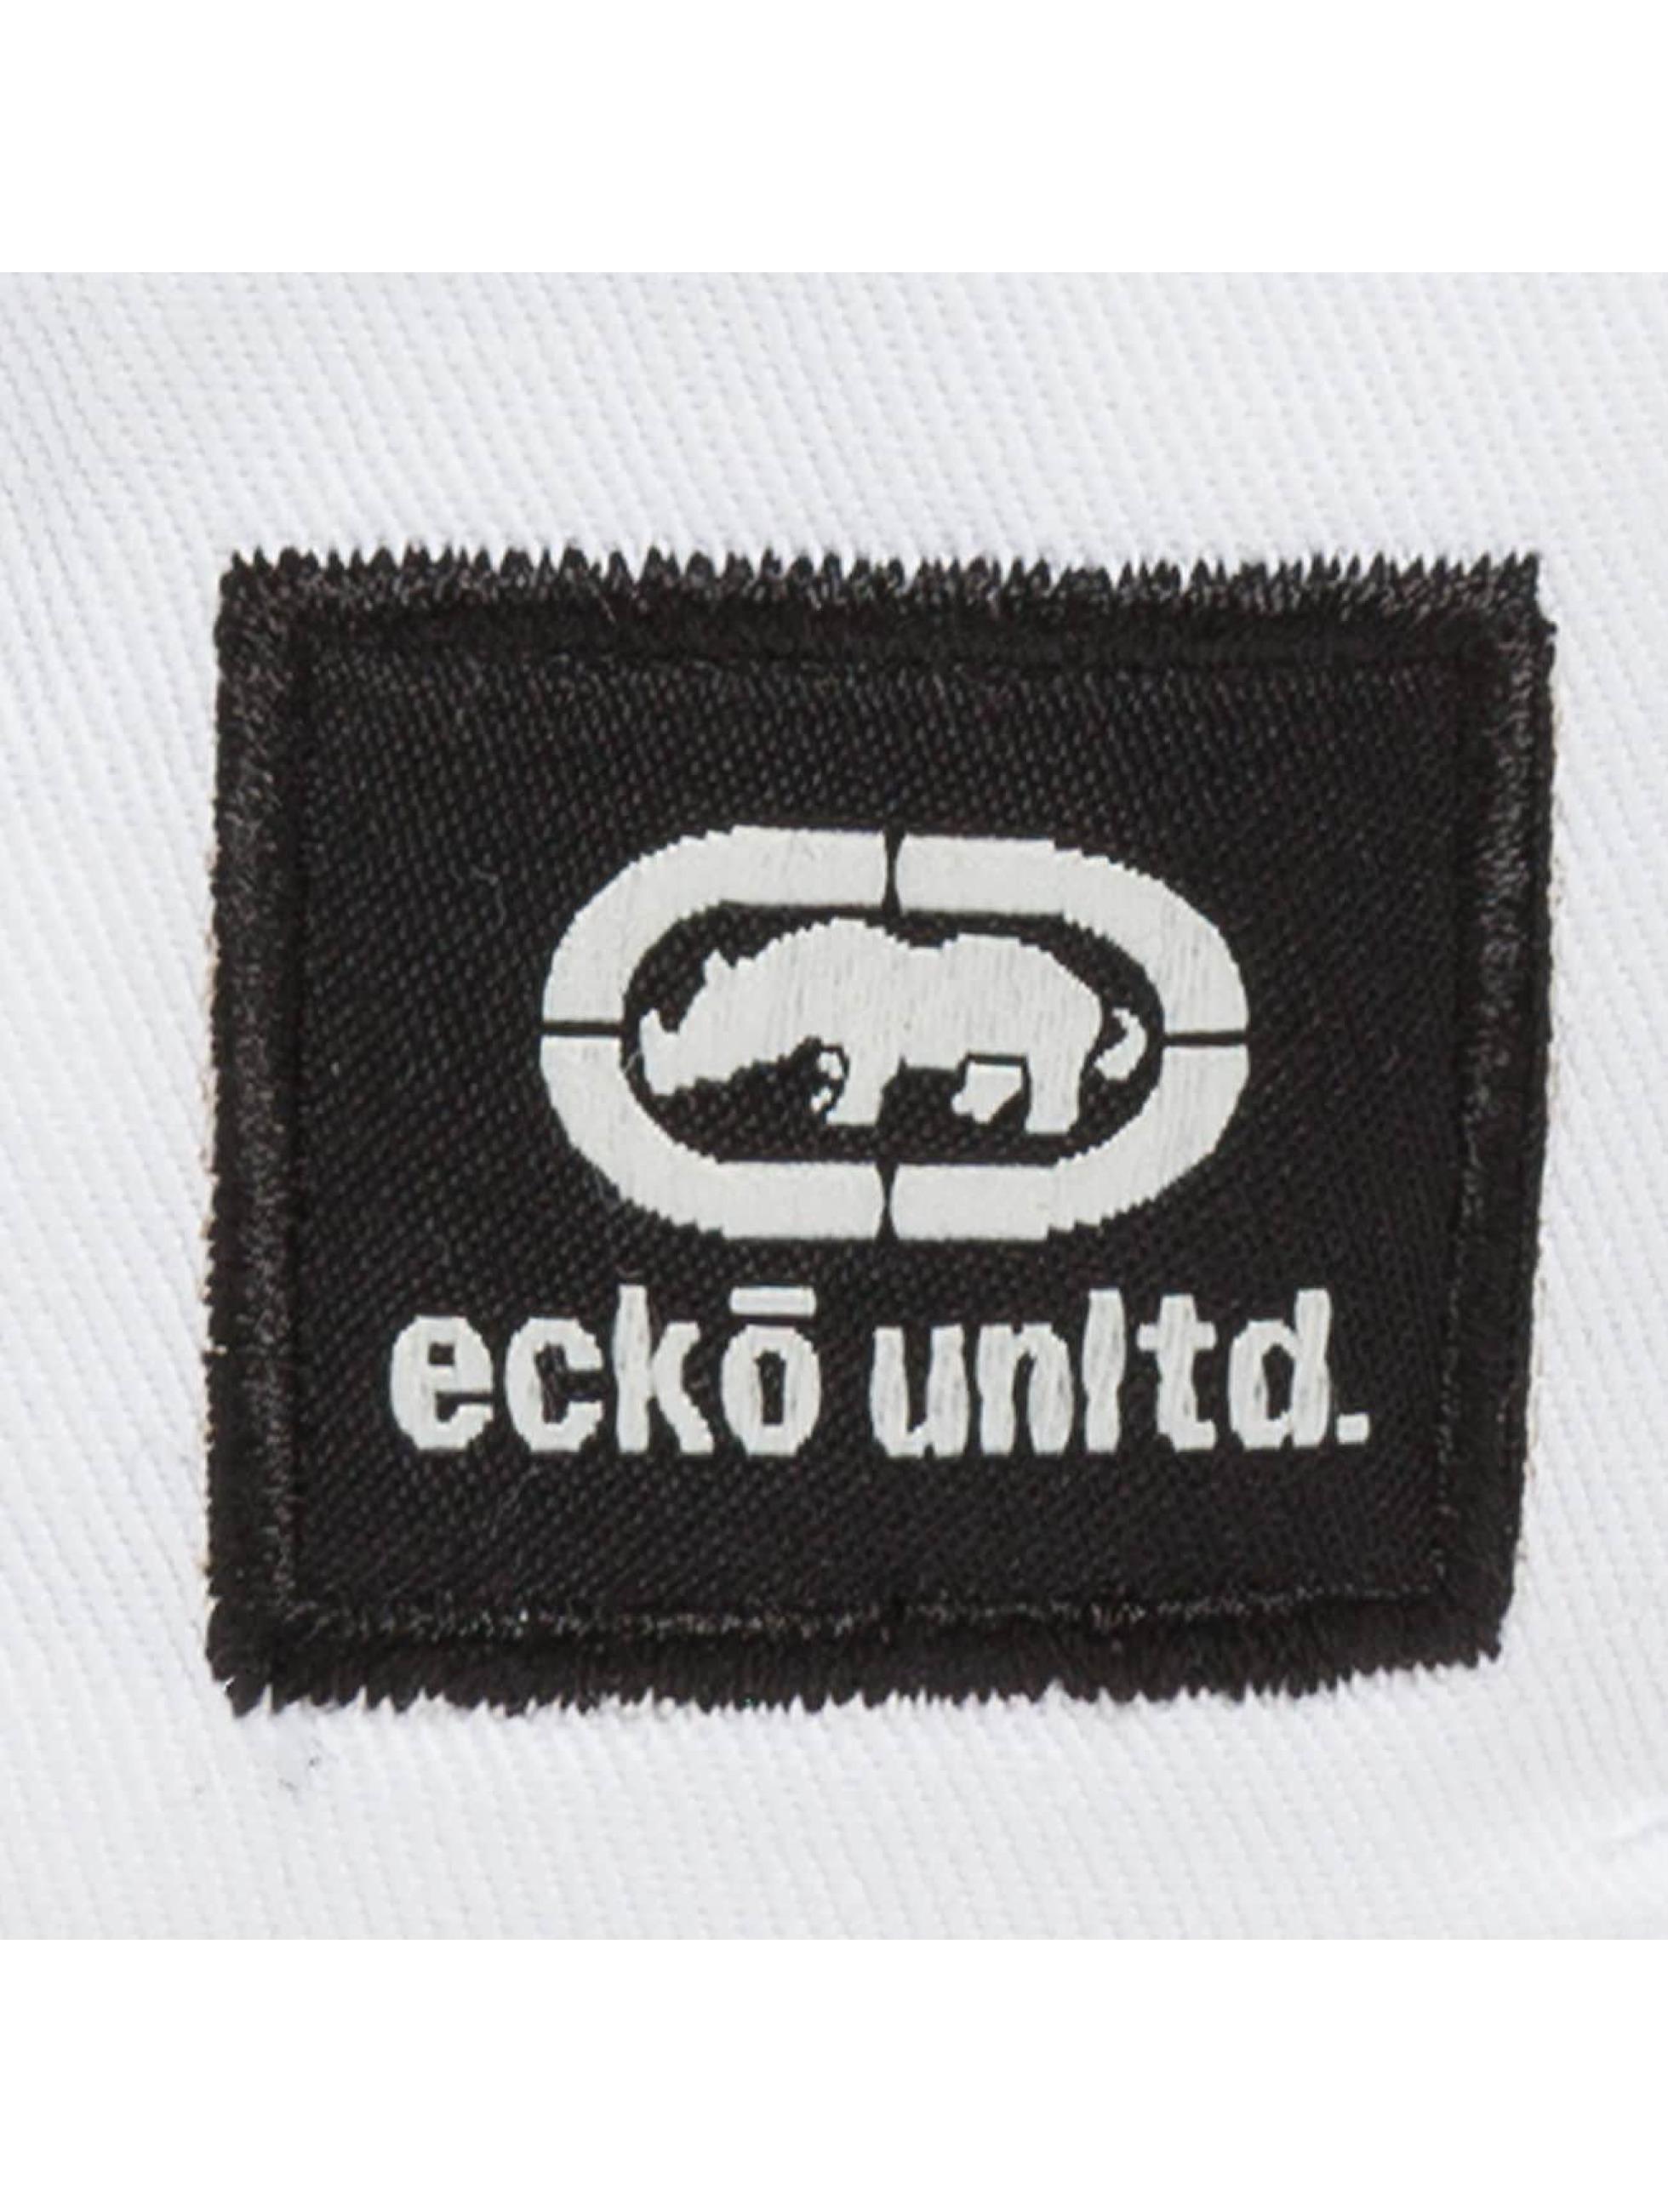 Ecko Unltd. Snapback Cap DolphinBay weiß